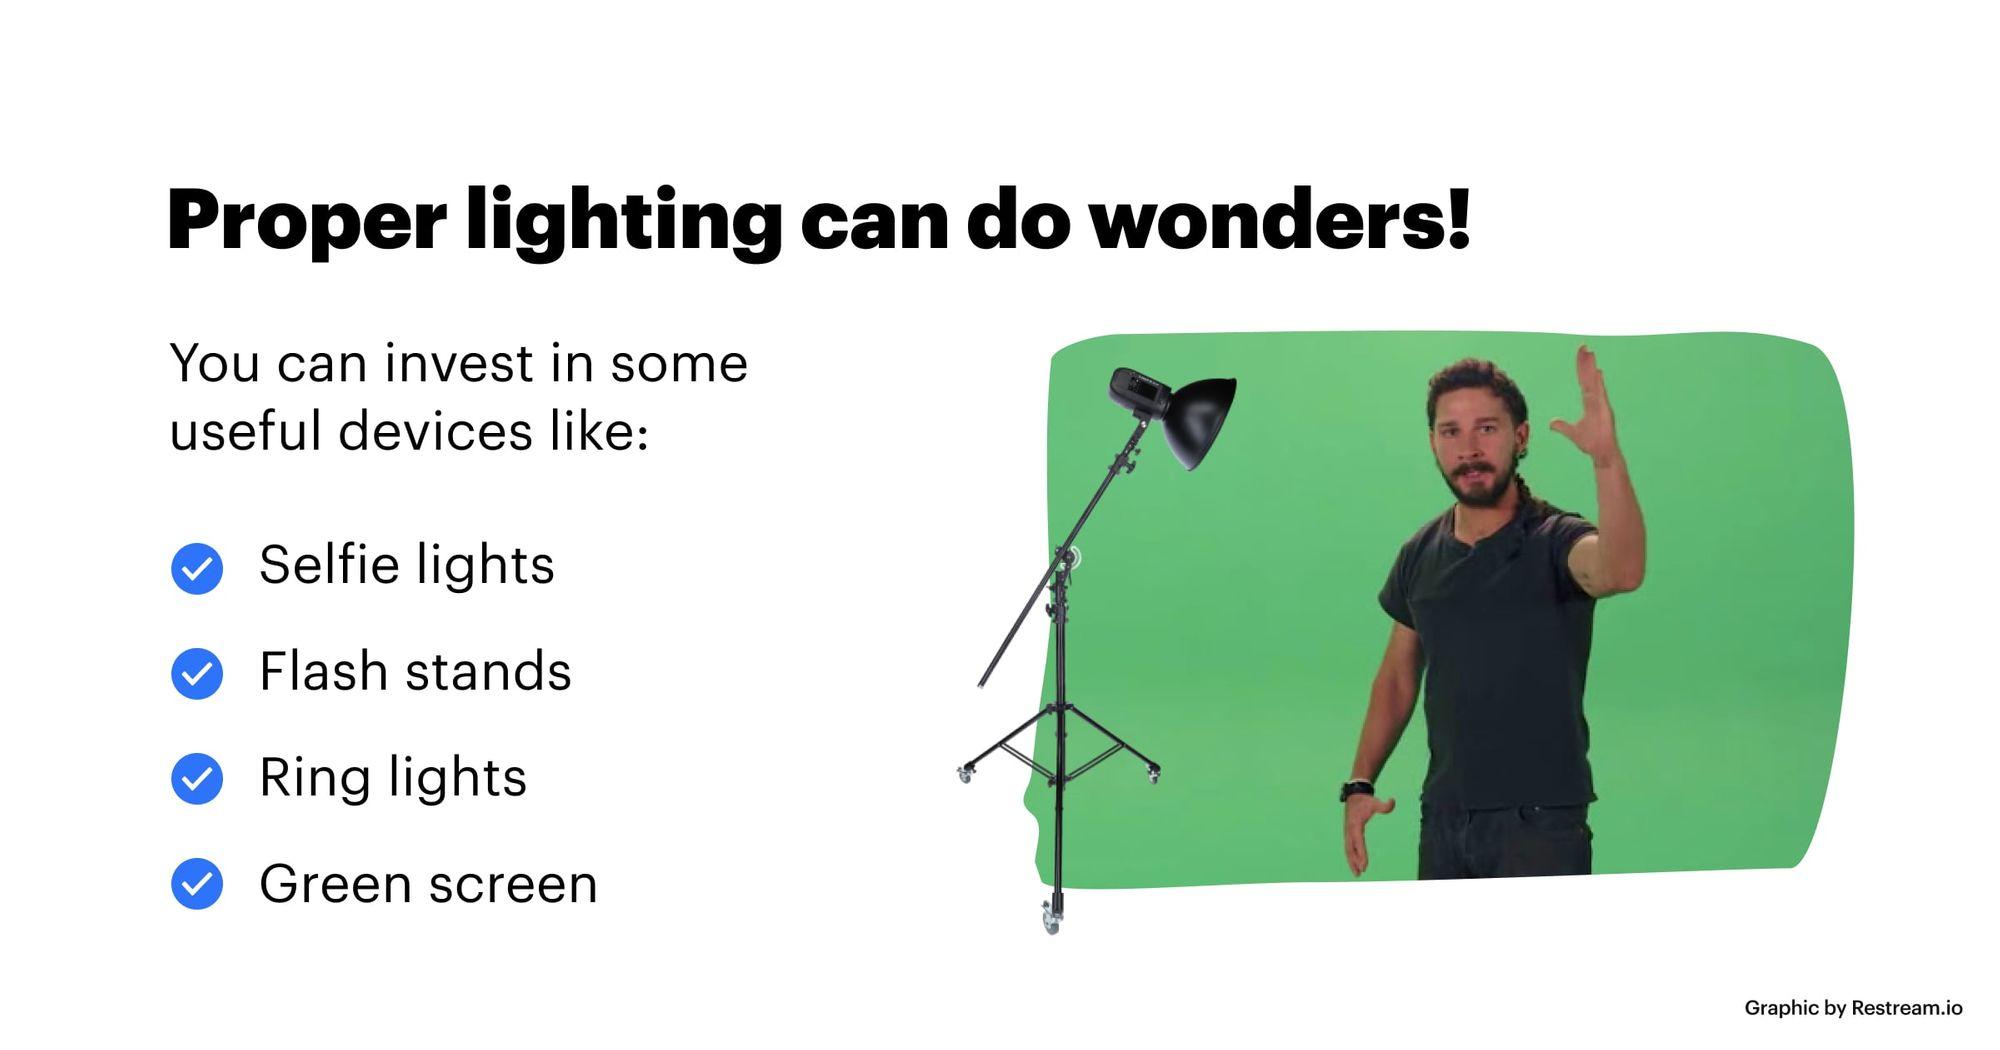 Proper lighting can do wonders!